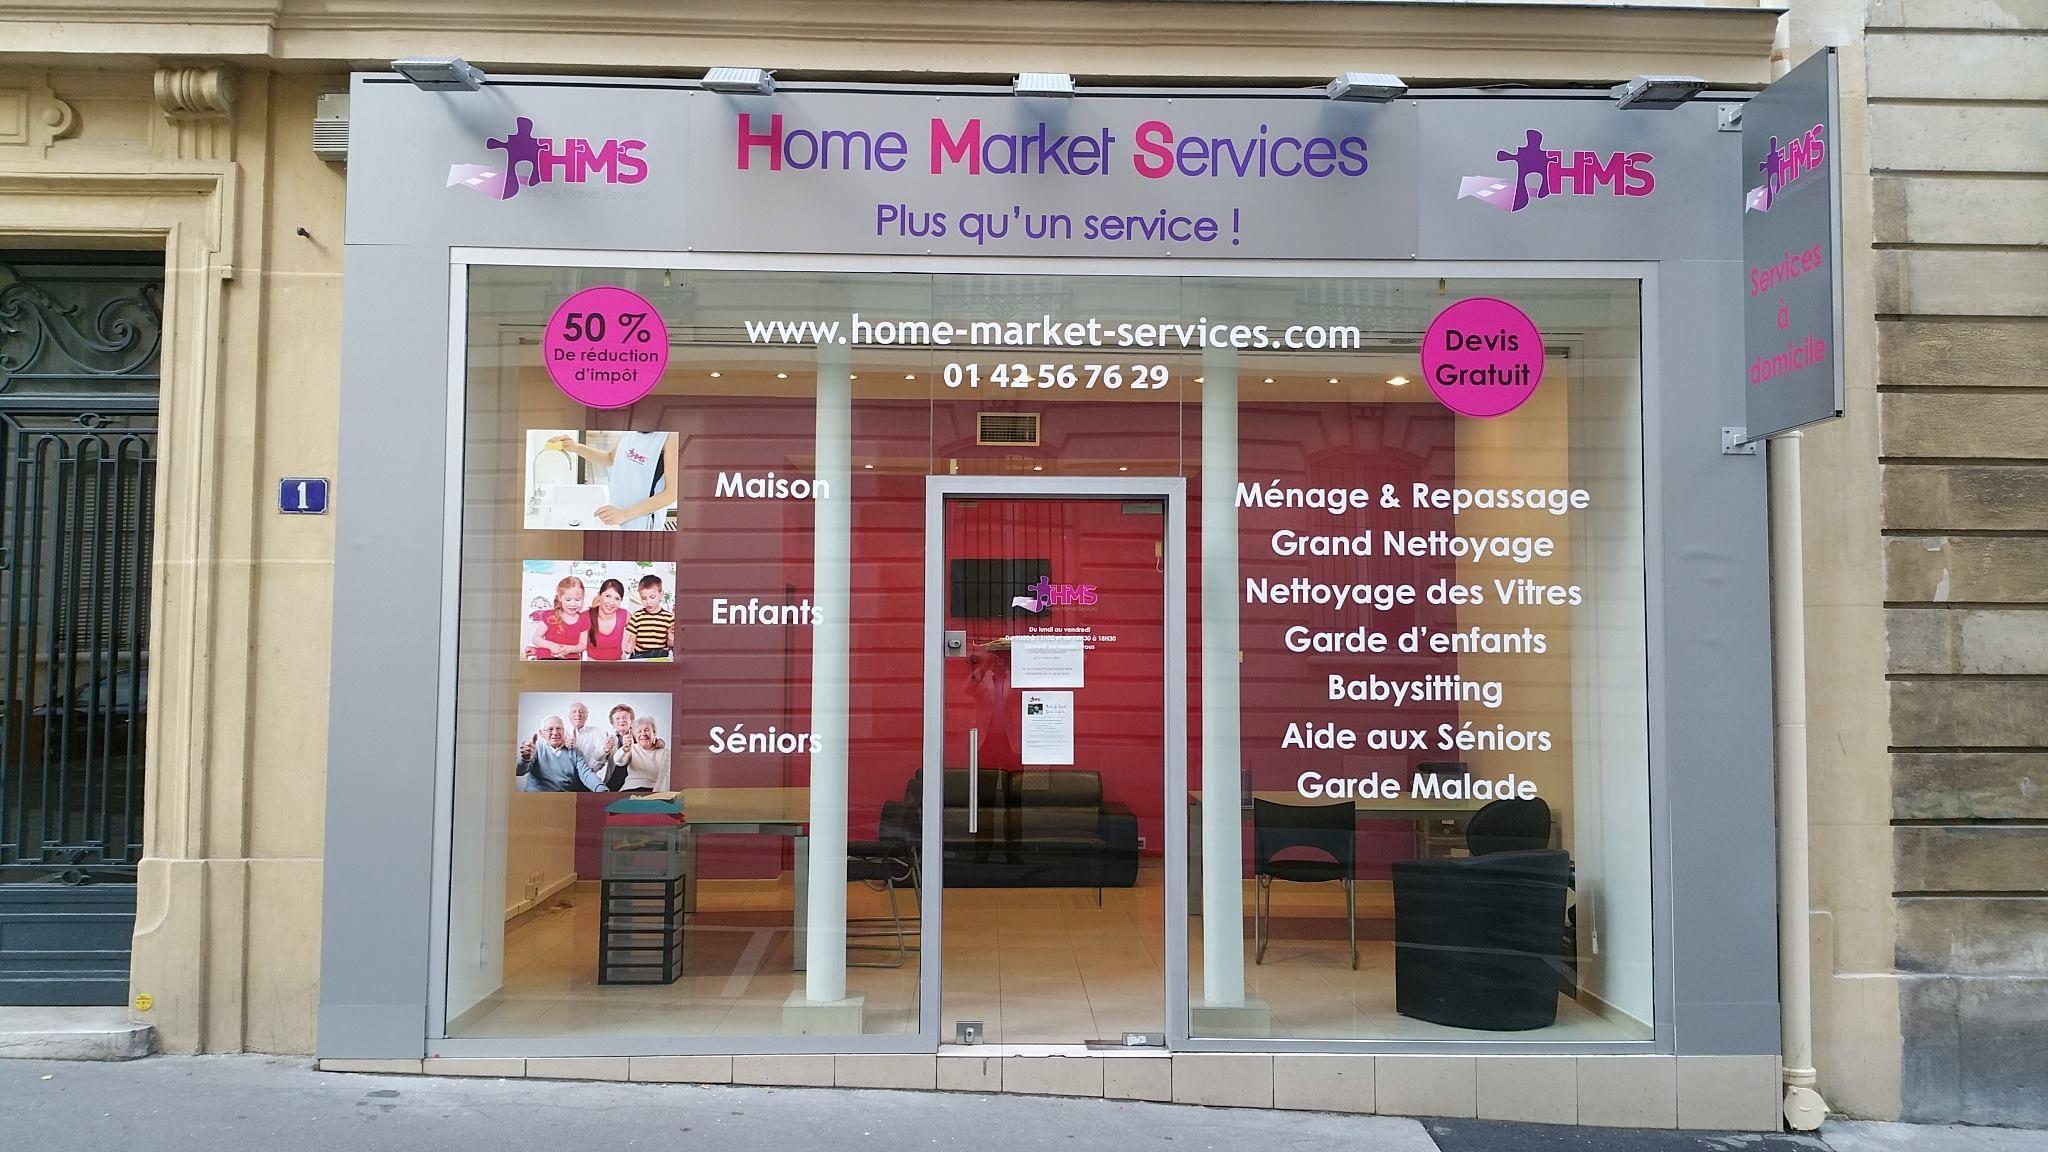 Agence Home Market Services Victor Hugo, 100 Avenue Victor Hugo 75016 Paris